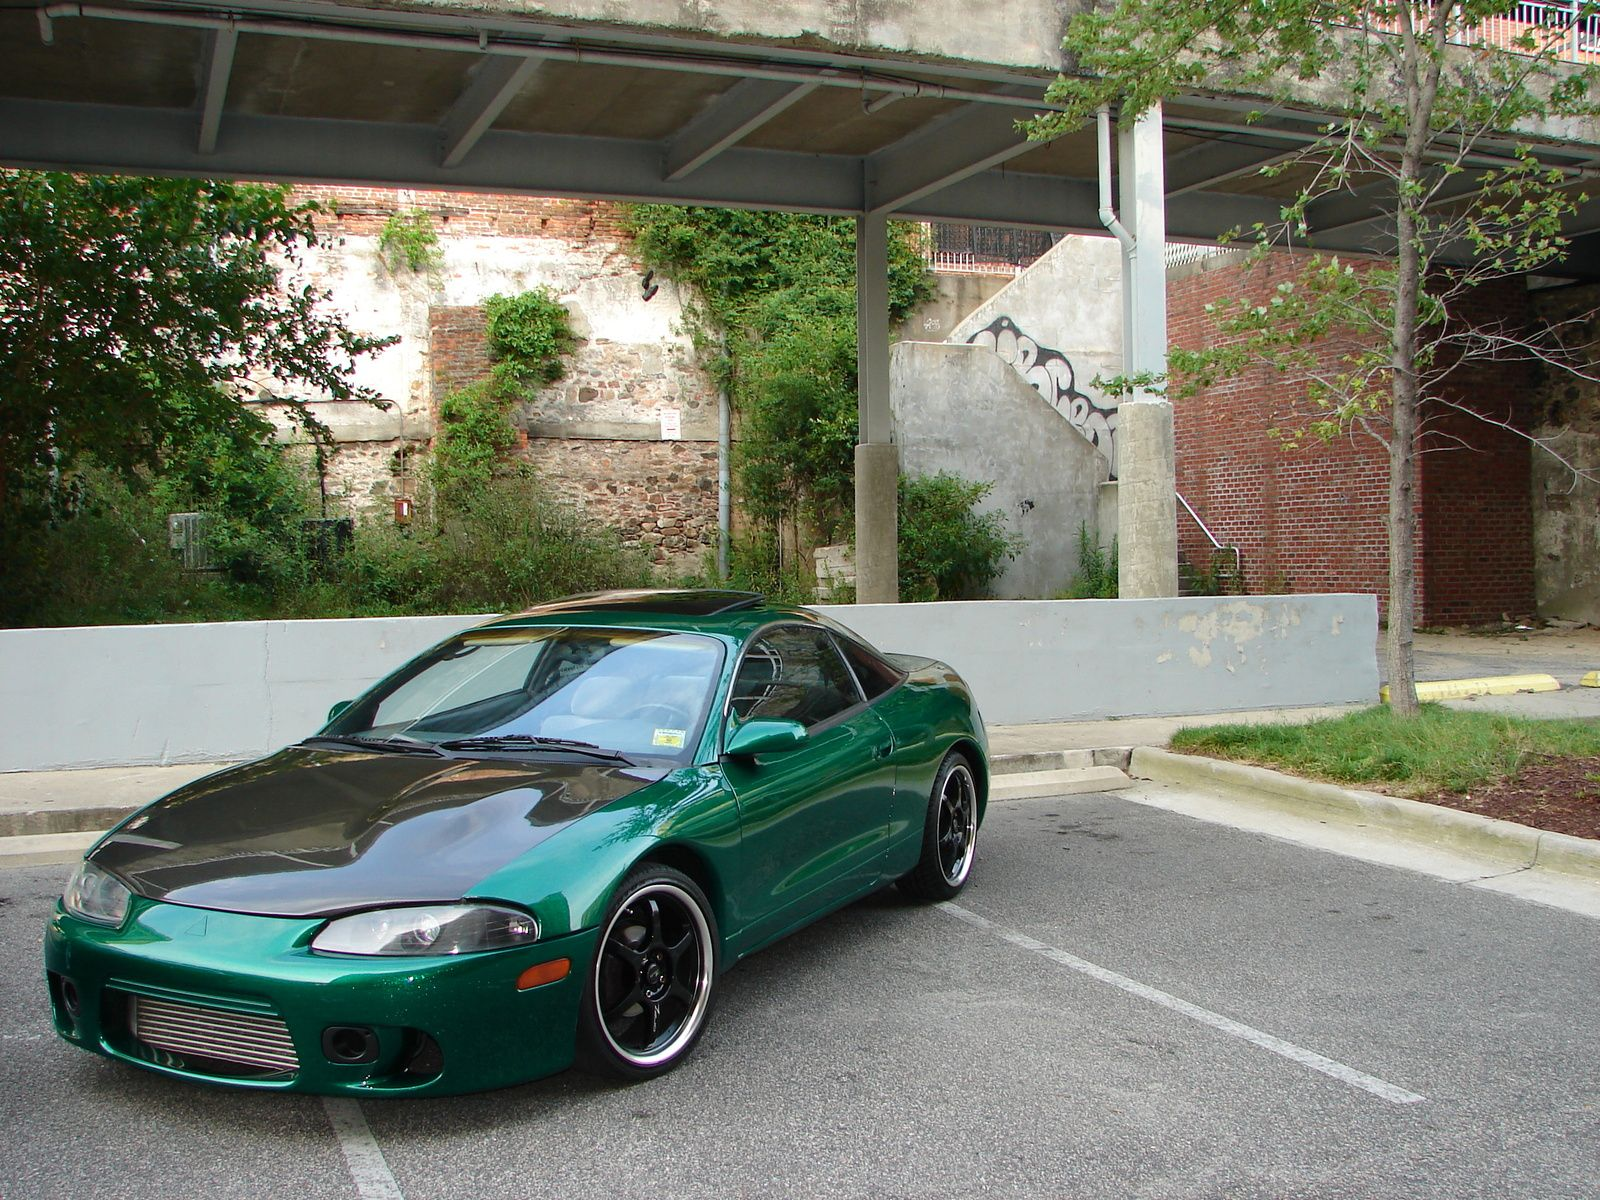 1998 Eclipse Gst Mitsubishi 2 Gst Eclipse Mitsubishi 1998 Turbo Dr